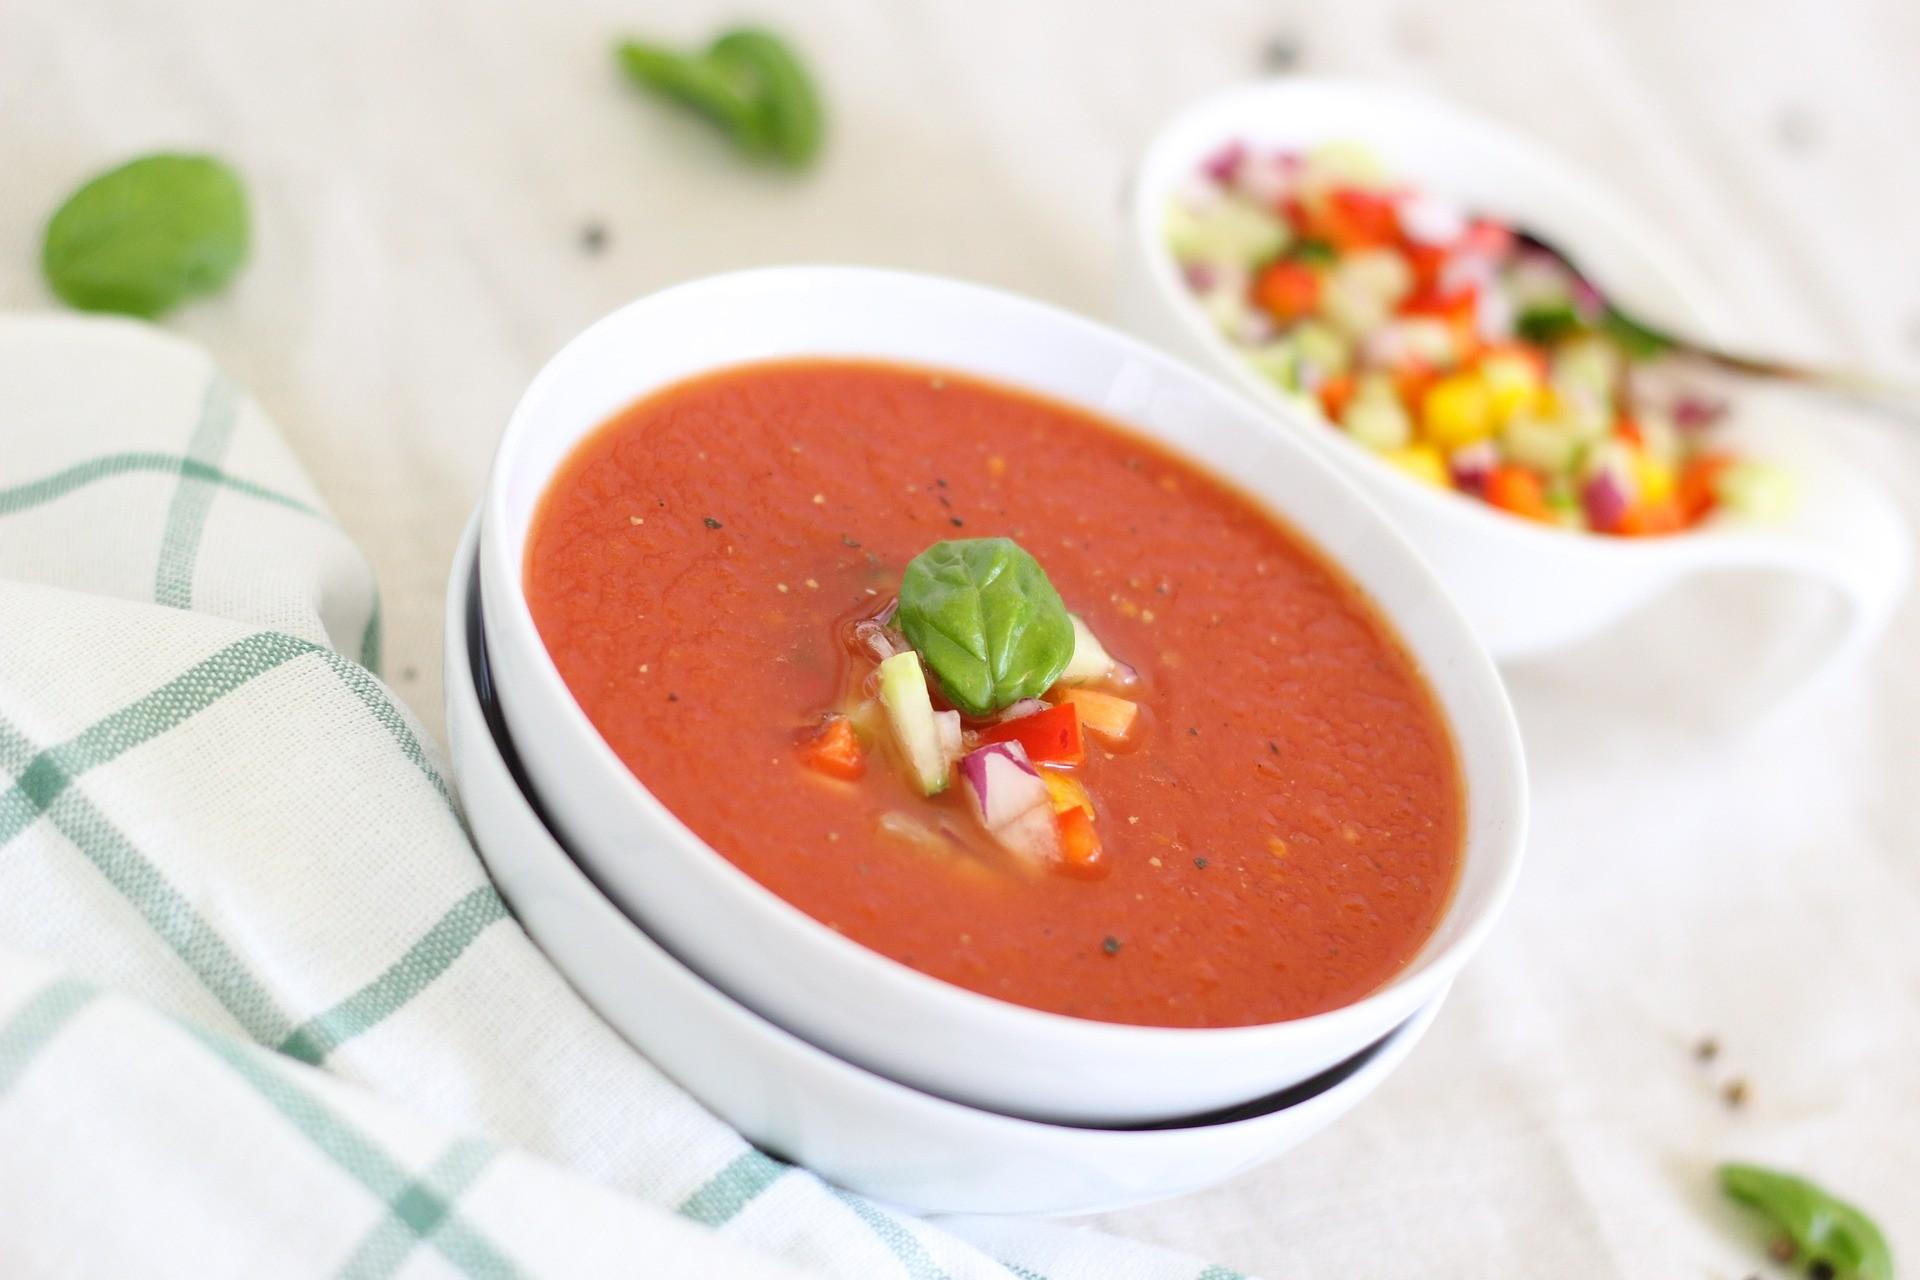 Receta: Sopa de tomate